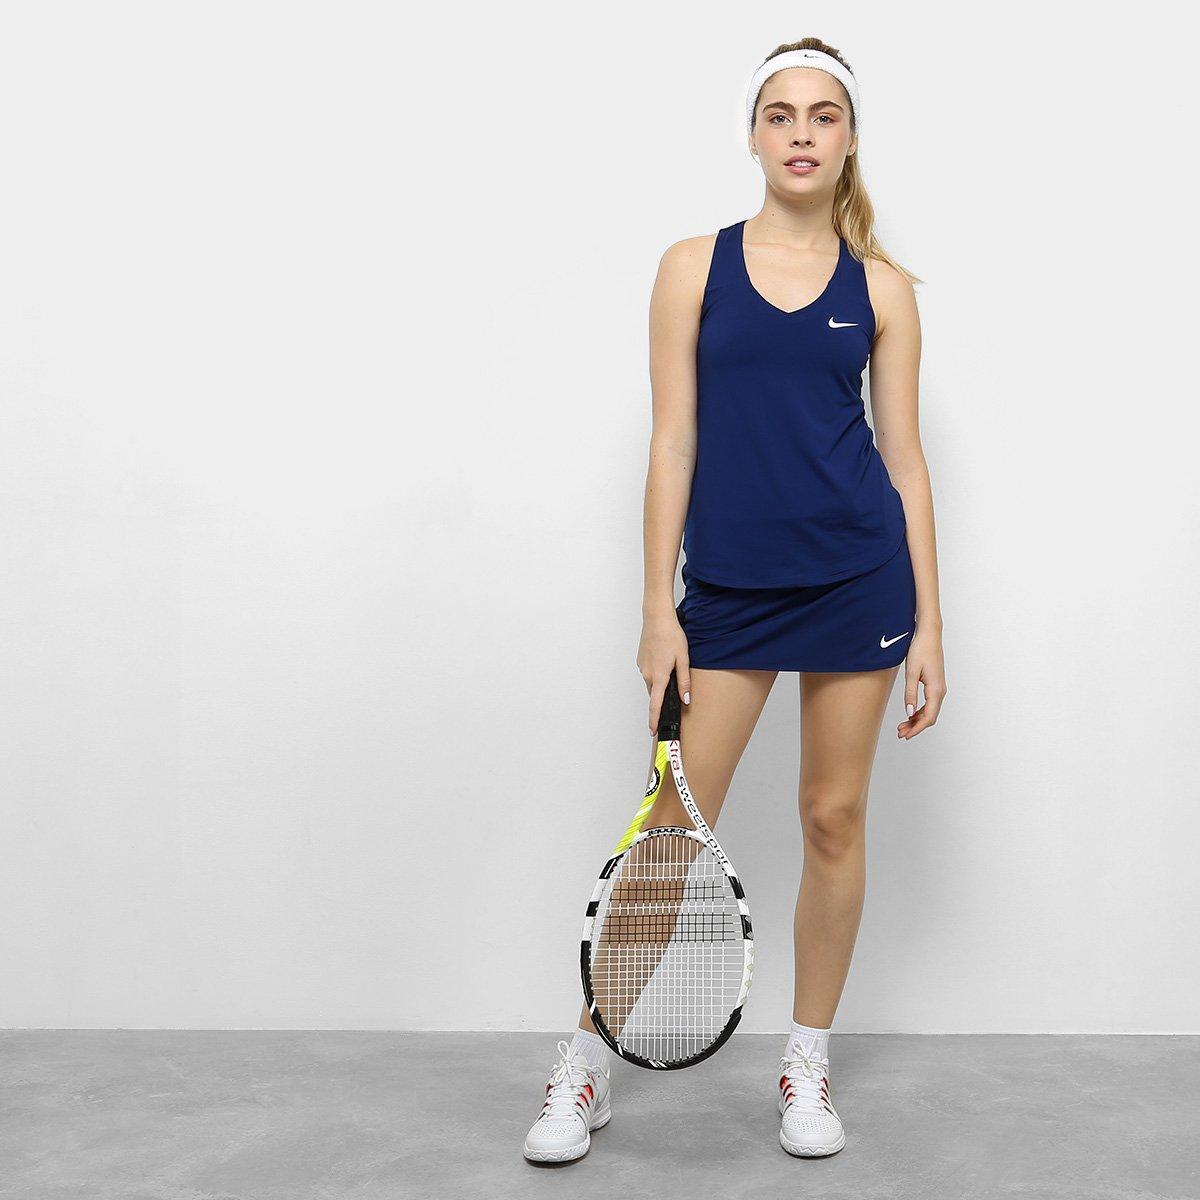 Nike Pure Pure Regata Marinho Feminina Nike Feminina Regata wURqZ7KIg